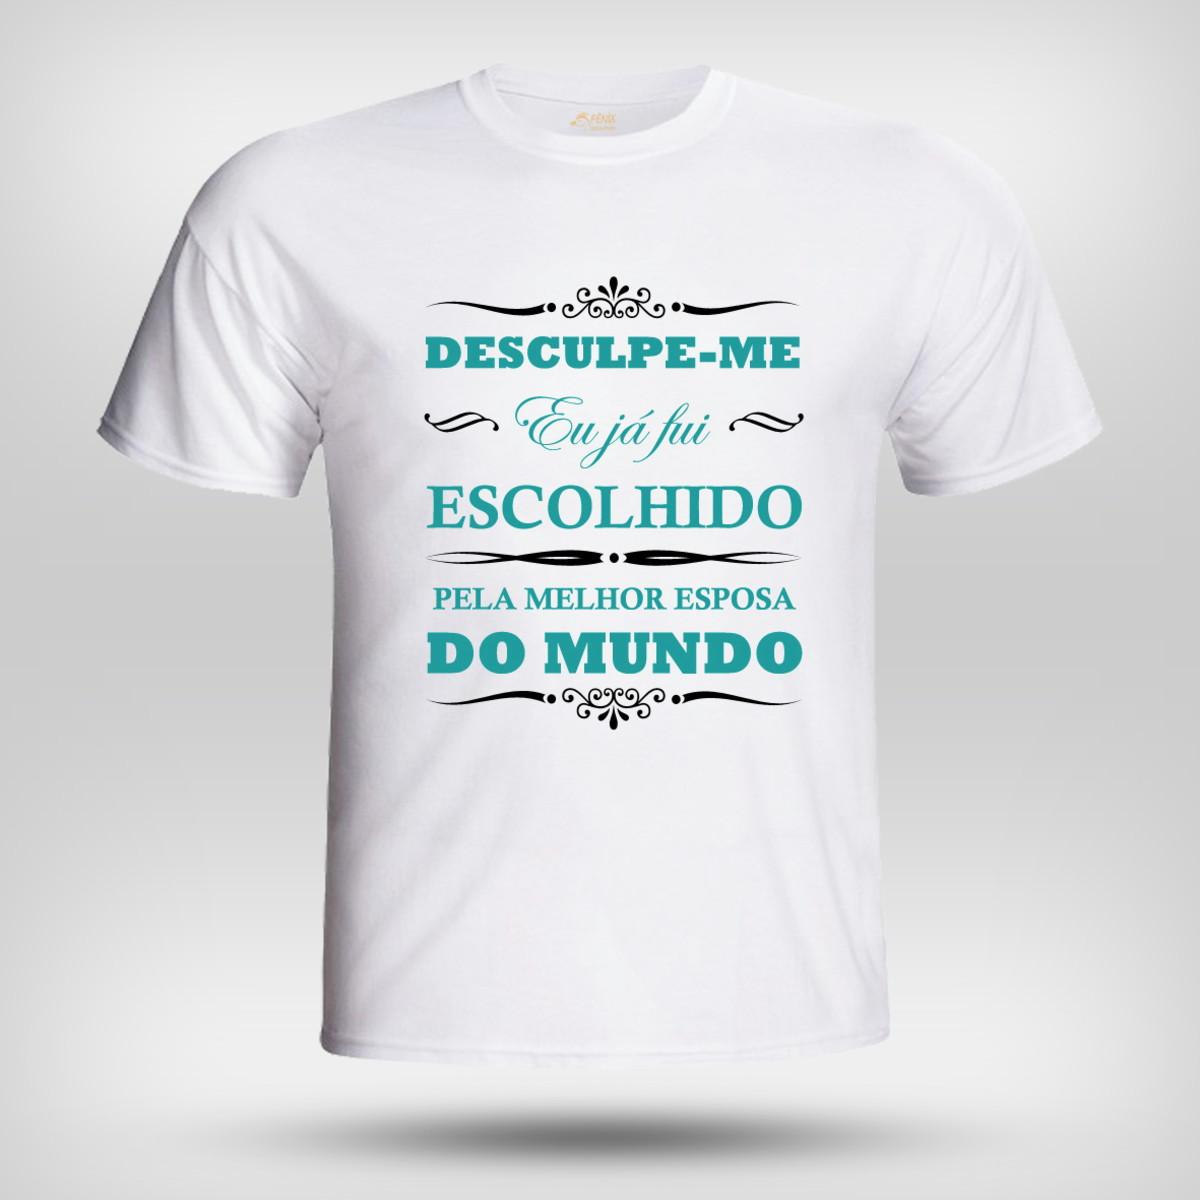 7459d45d0 Camiseta ou Baby Look Carnaval Personalizada no Elo7 | Fênix Design ...